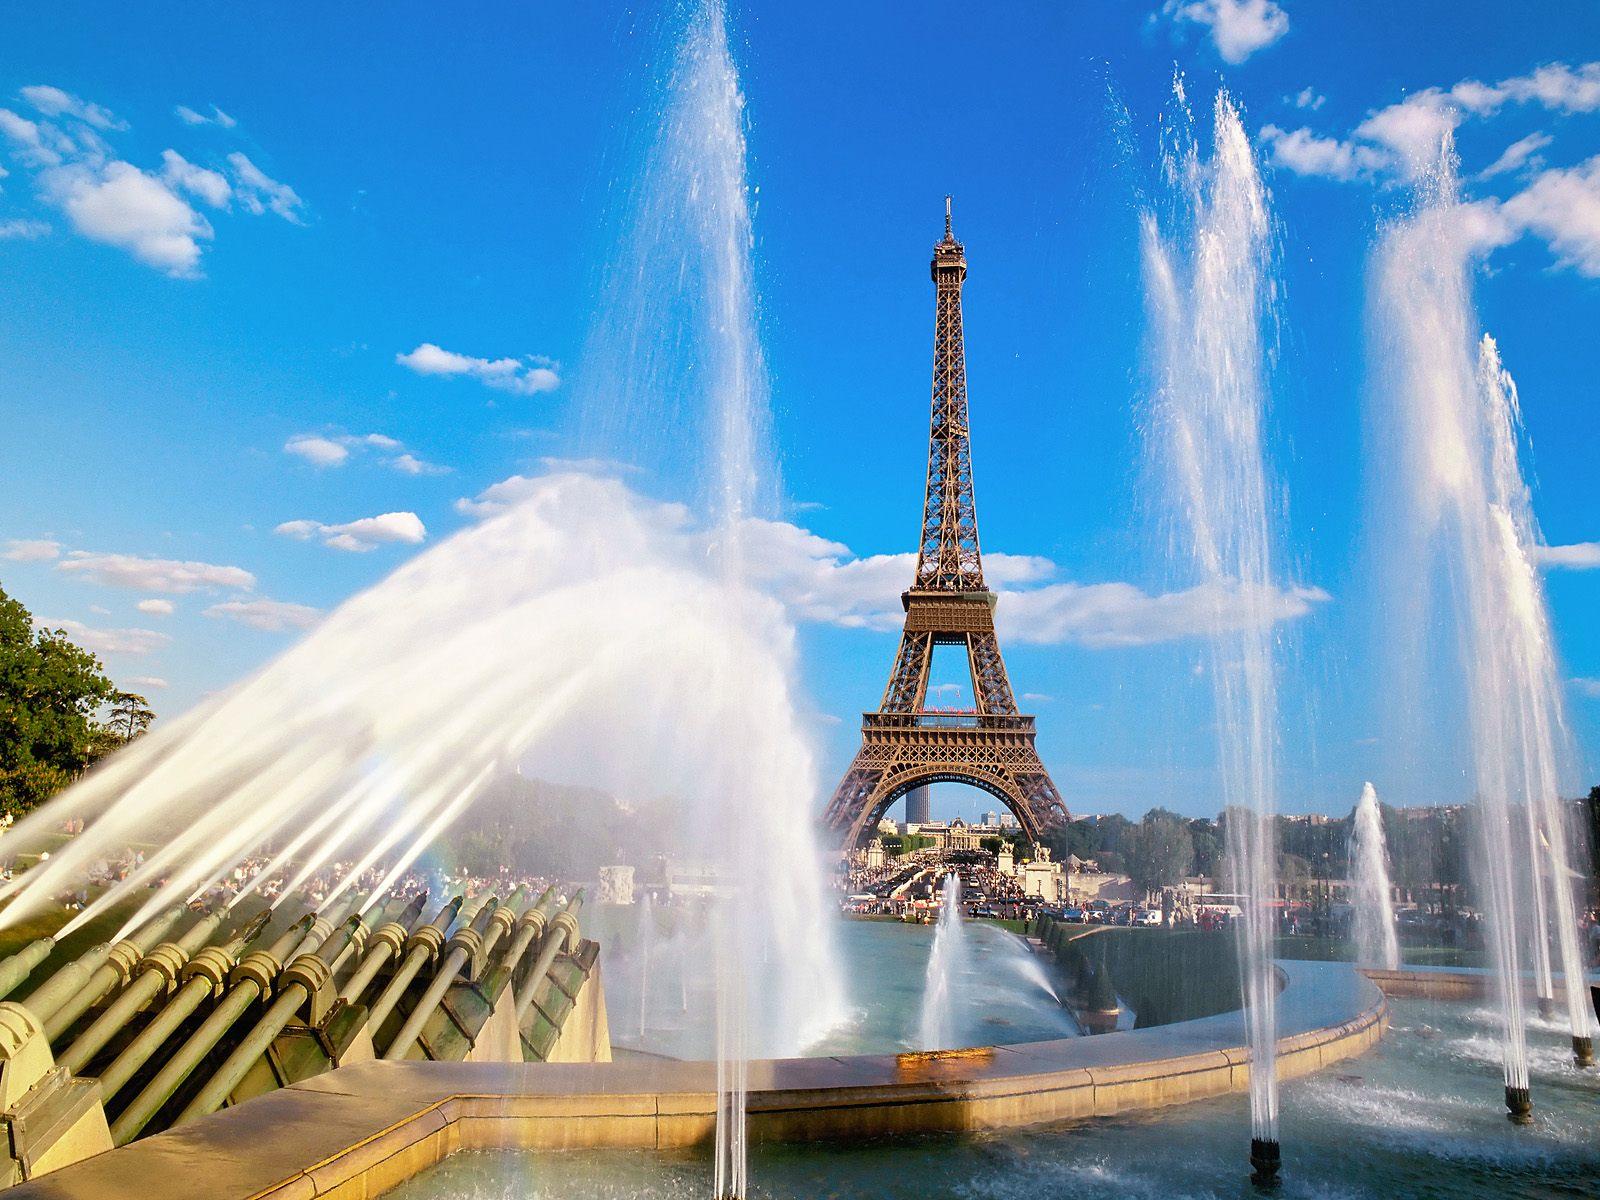 http://2.bp.blogspot.com/-0ypp6QWe6z4/TlUol5JMlOI/AAAAAAAAA6U/2fUprolxRQo/s1600/Eiffel_Tower_Paris_France_021.jpg